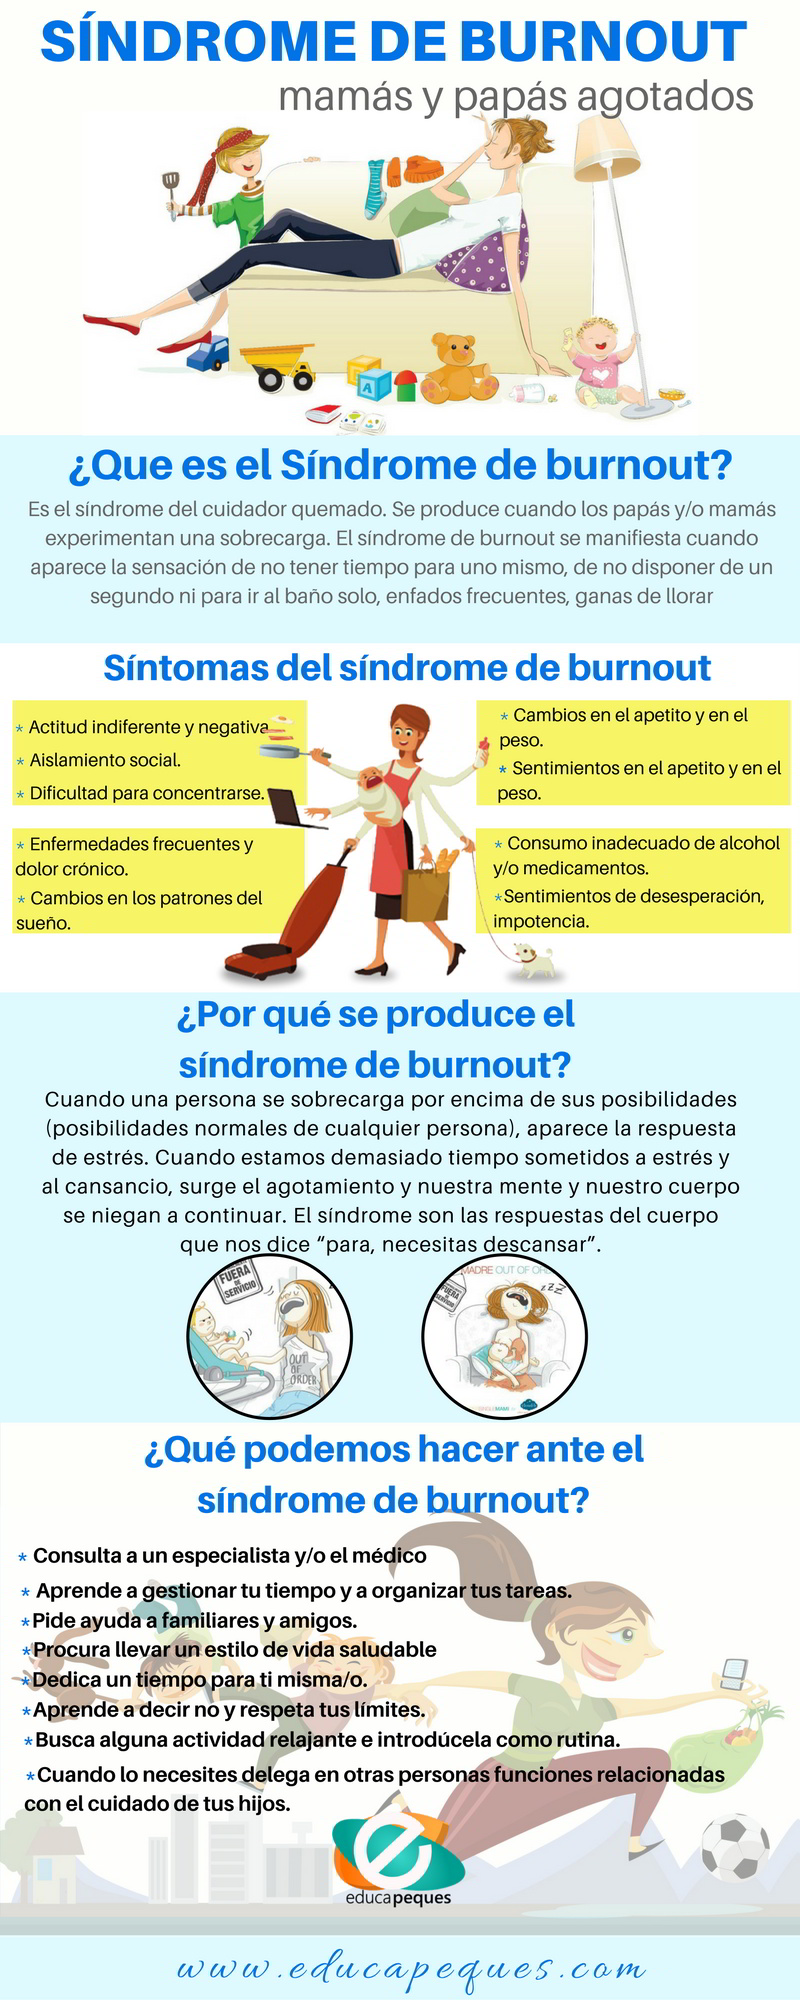 Padres agotados, síndrome de Burnout